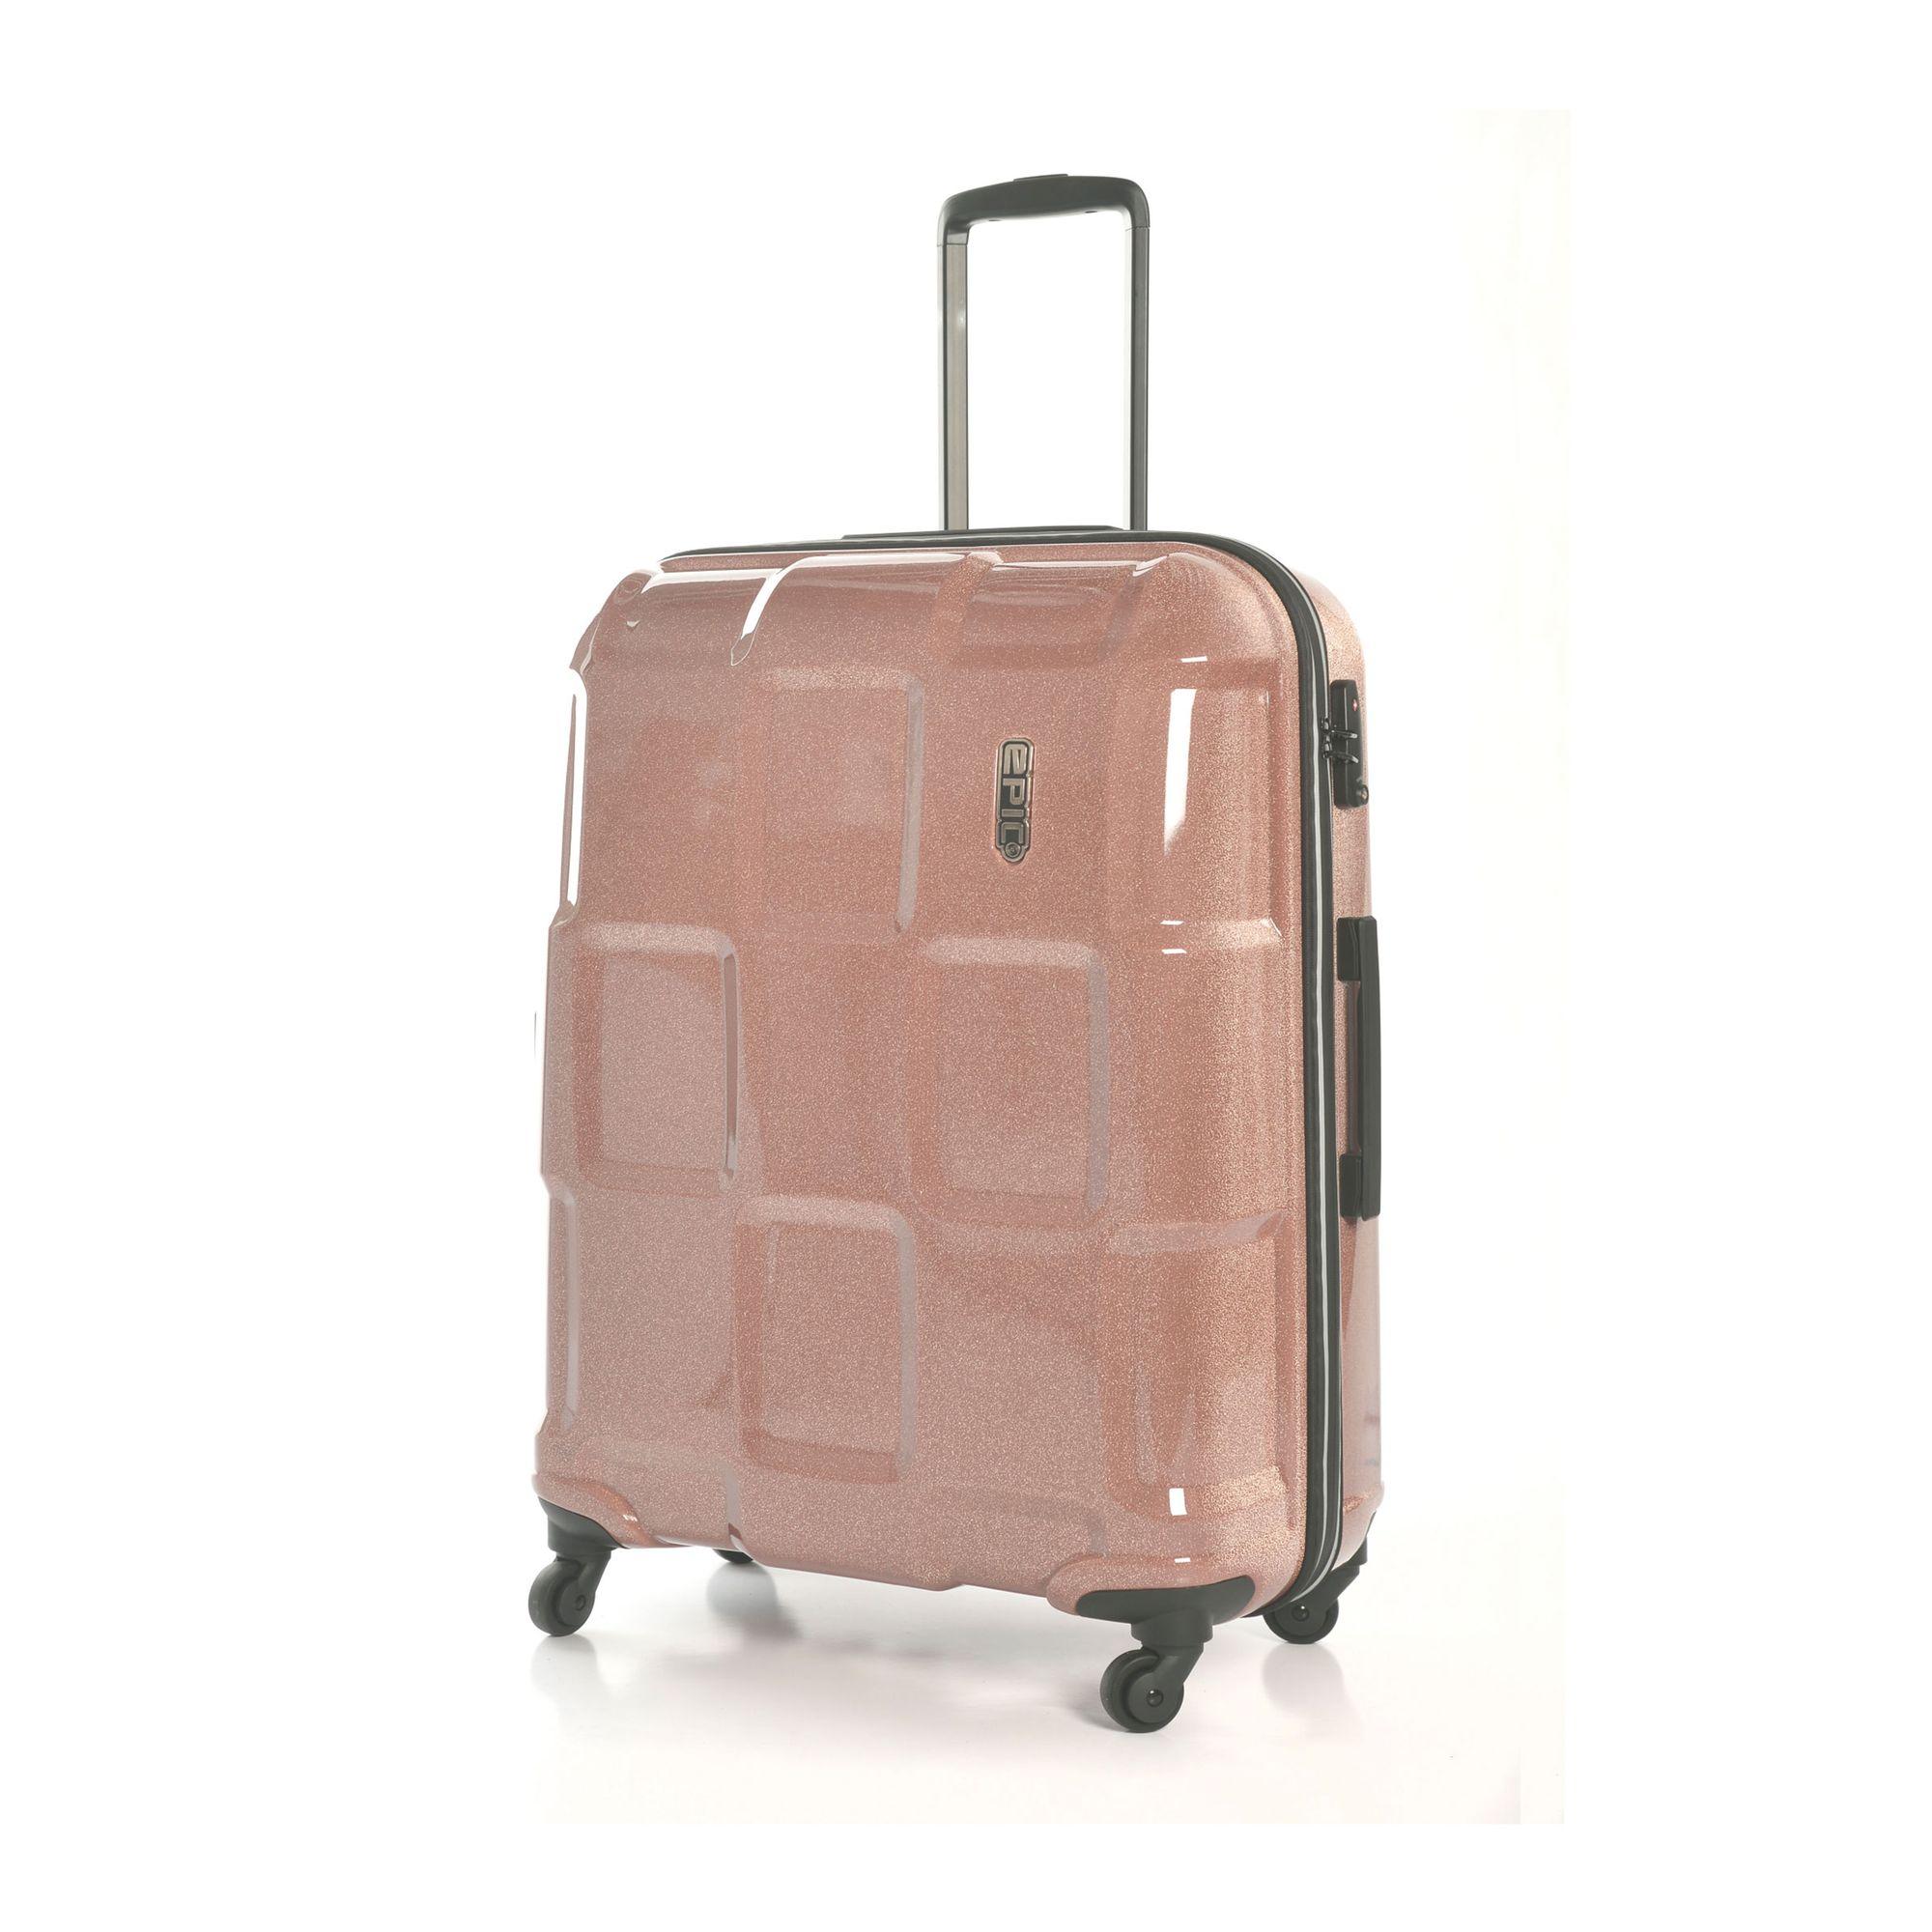 f54e68d8 Kjøp Epic EPIC Crate Reflex hard koffert, 4 hjul, 55/66/76 cm her ...